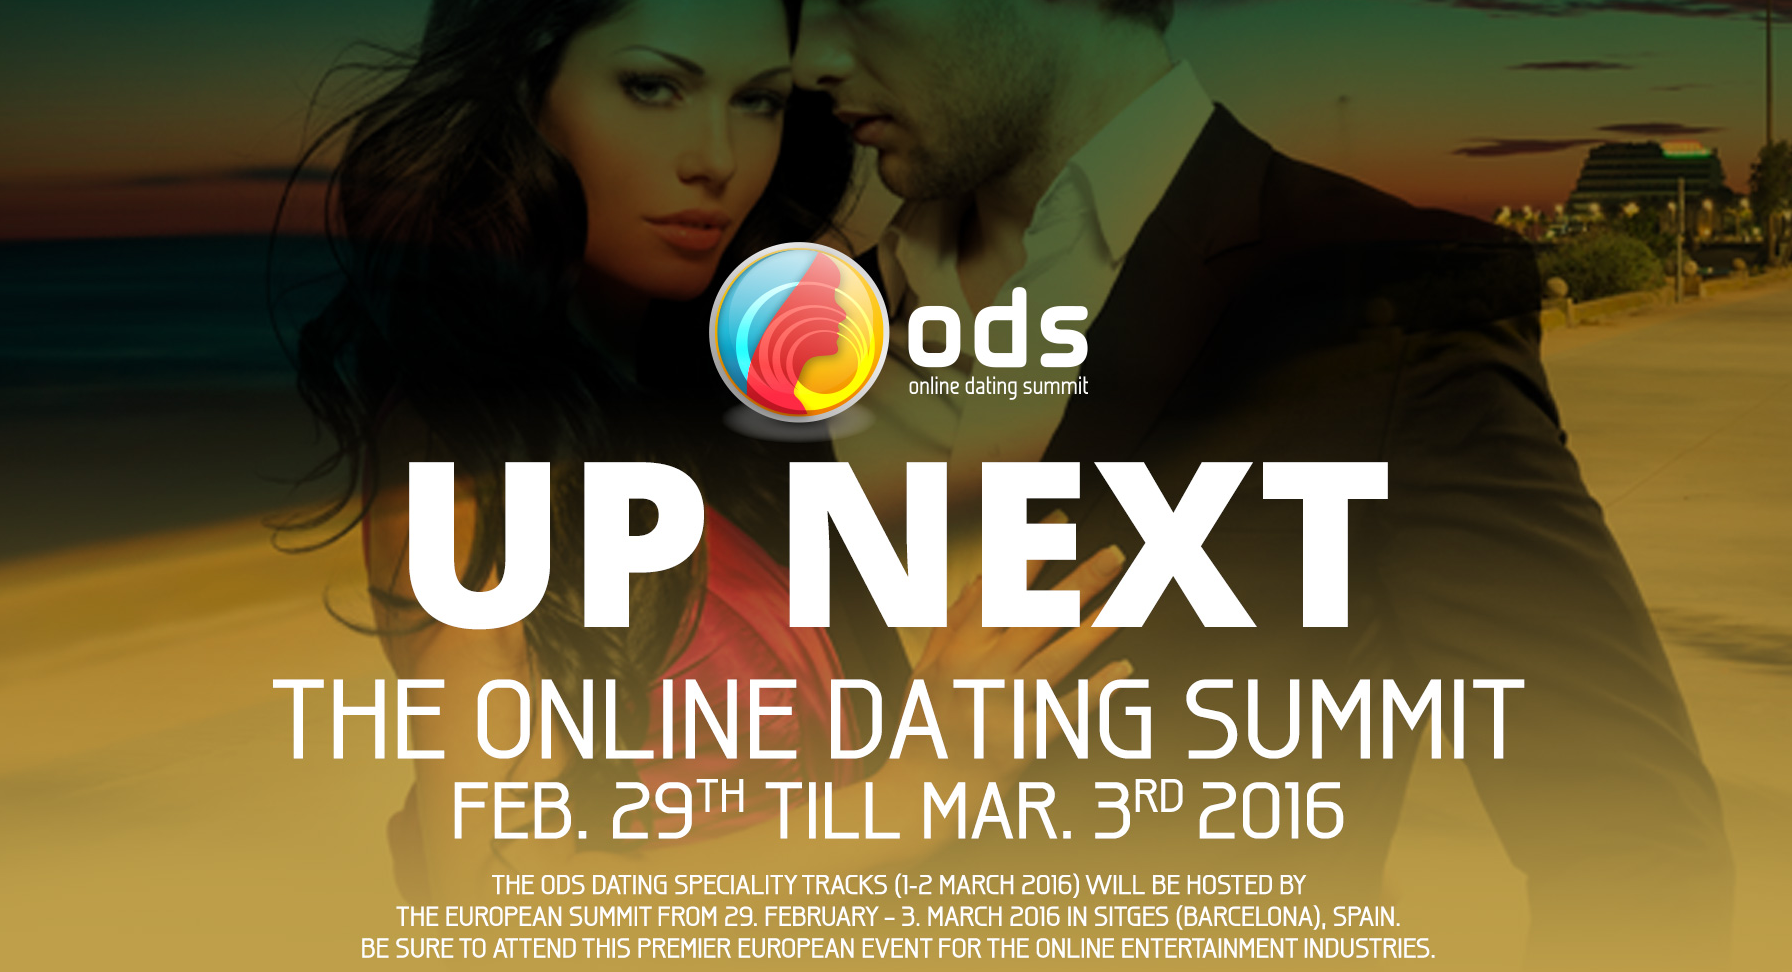 simon edmunds global dating insights